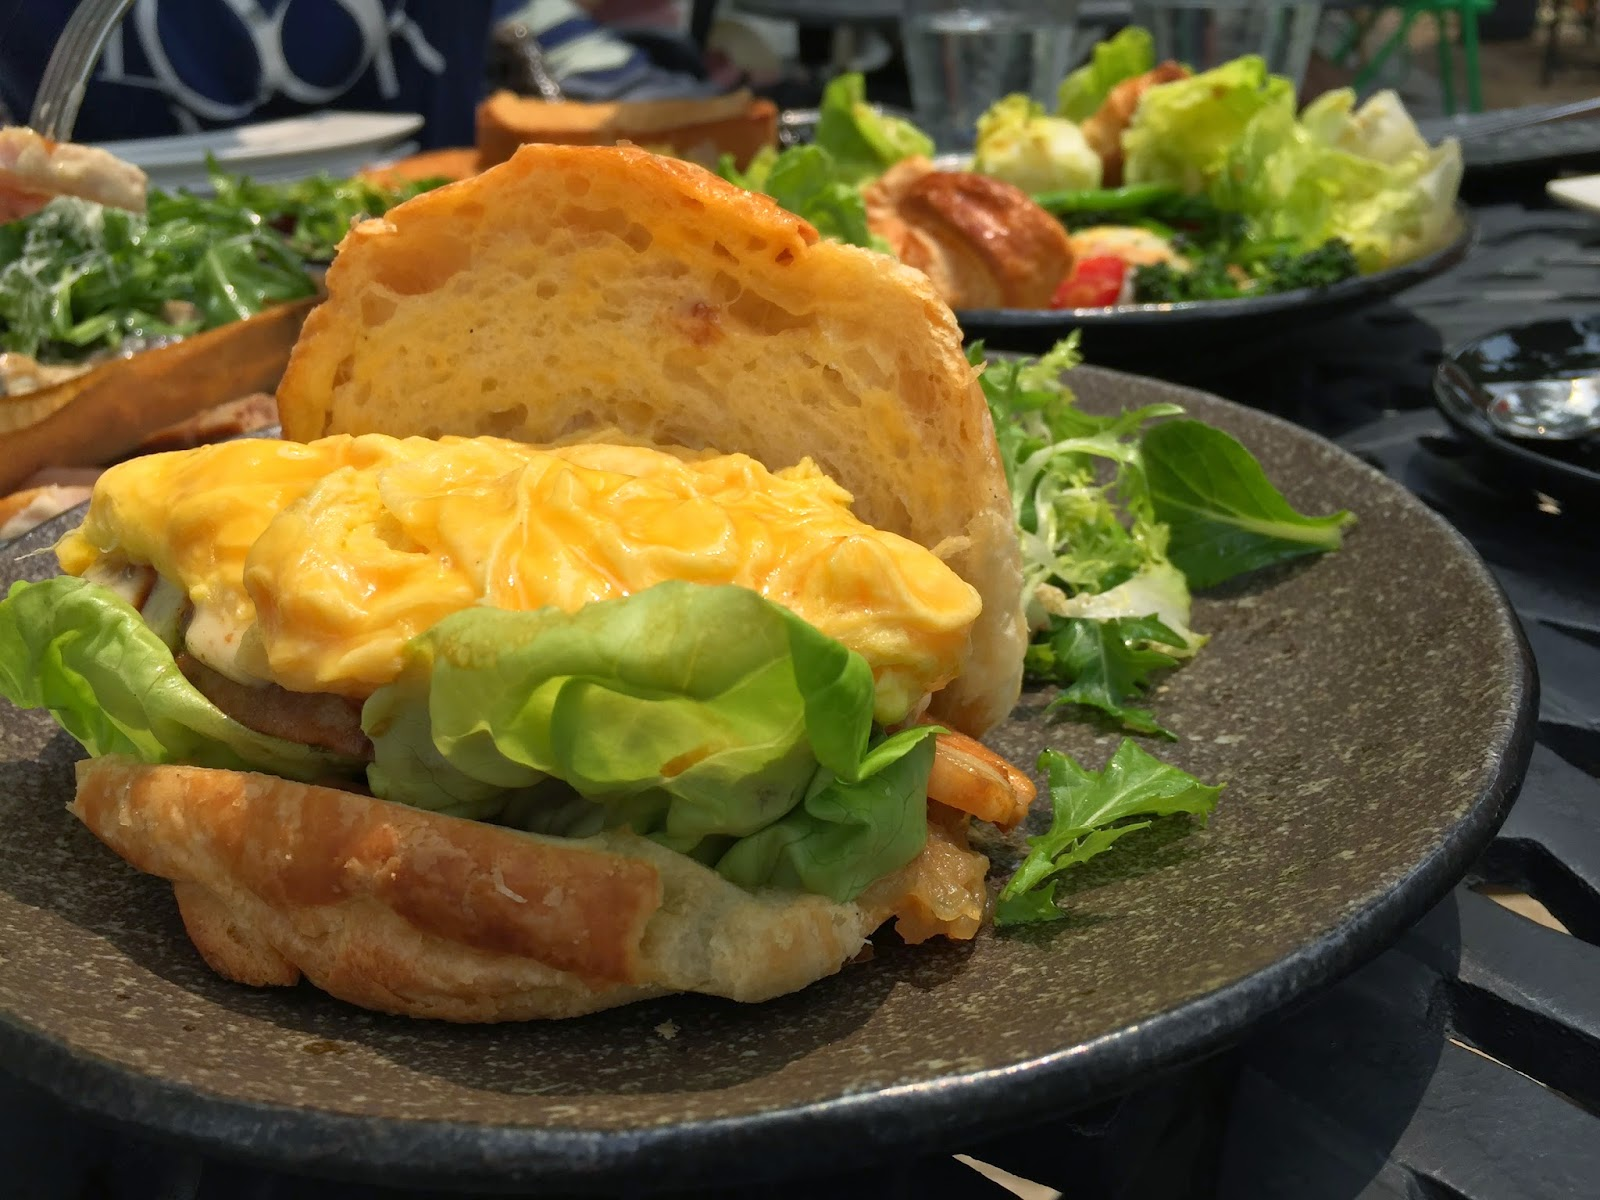 Symmetry - Pork Croissant